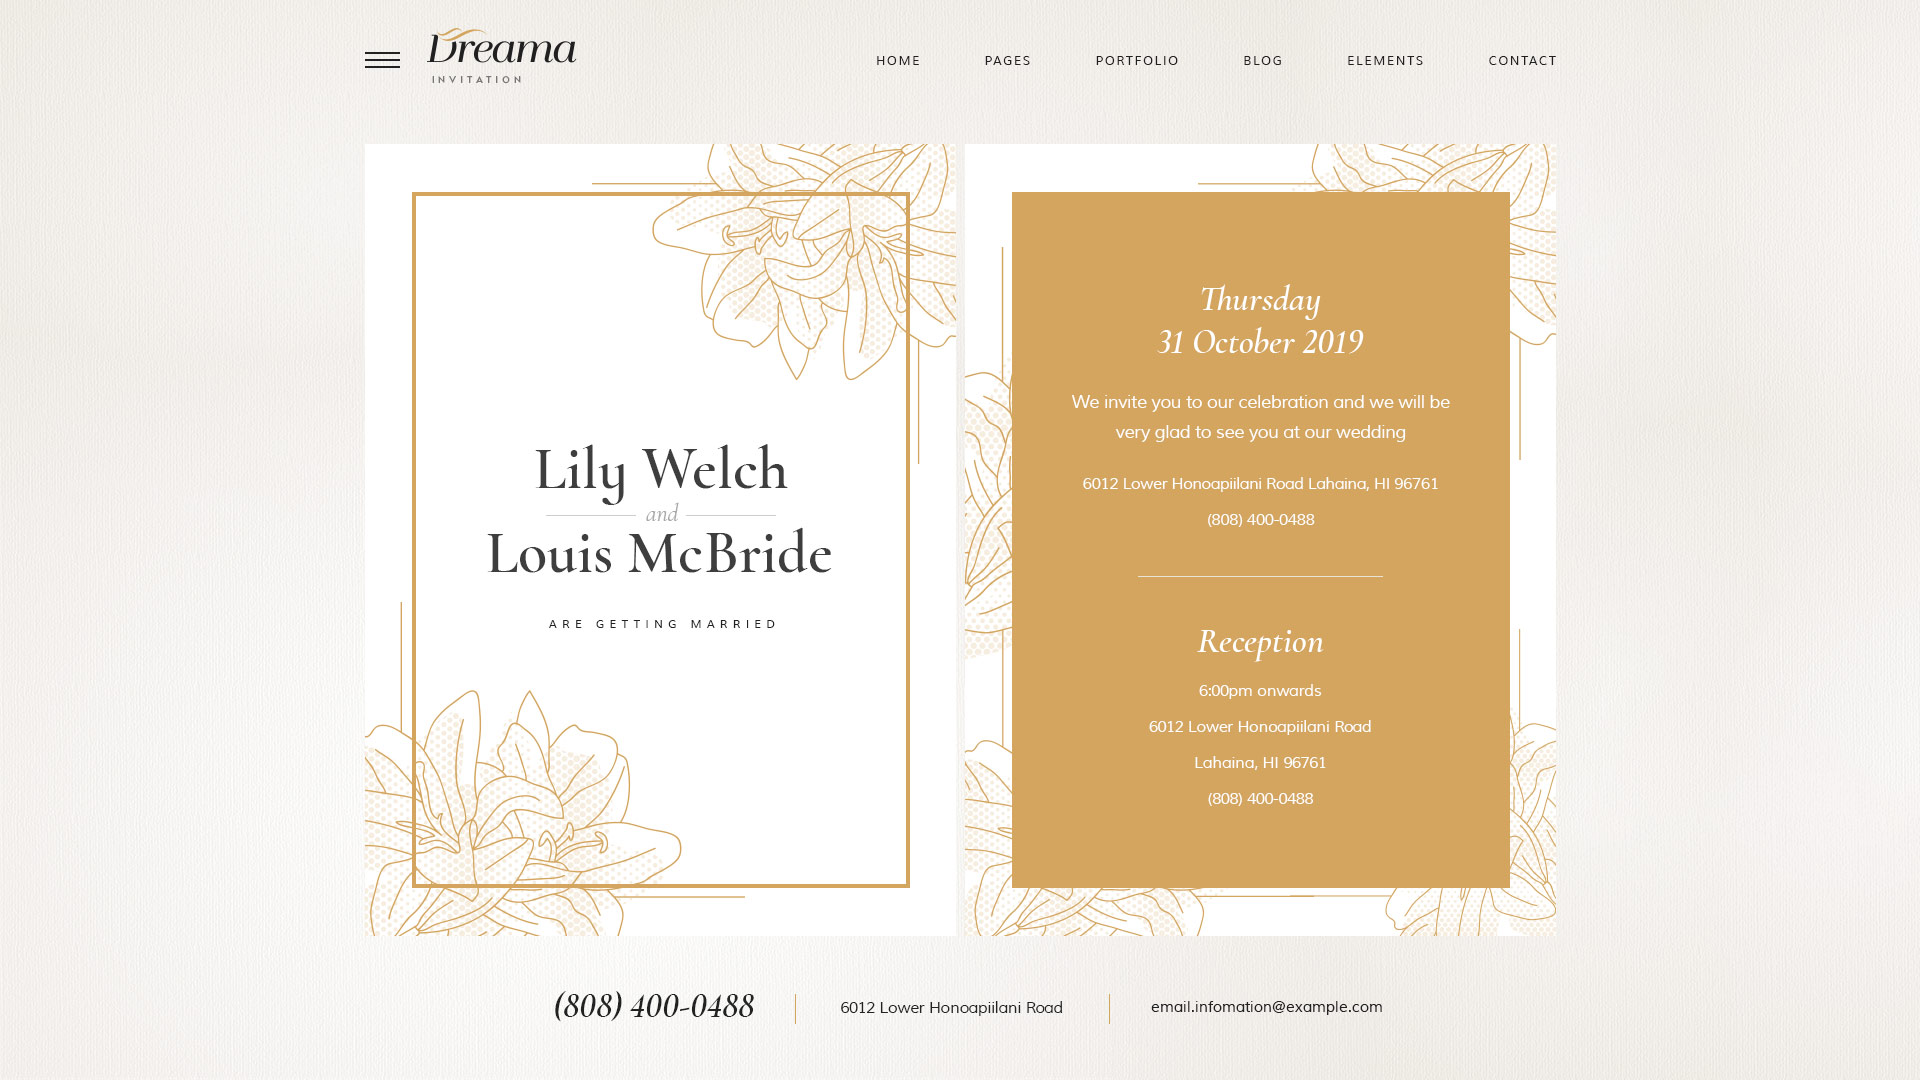 Dreama - Engagement & Wedding Planner WordPress Theme by Opal_WP ...